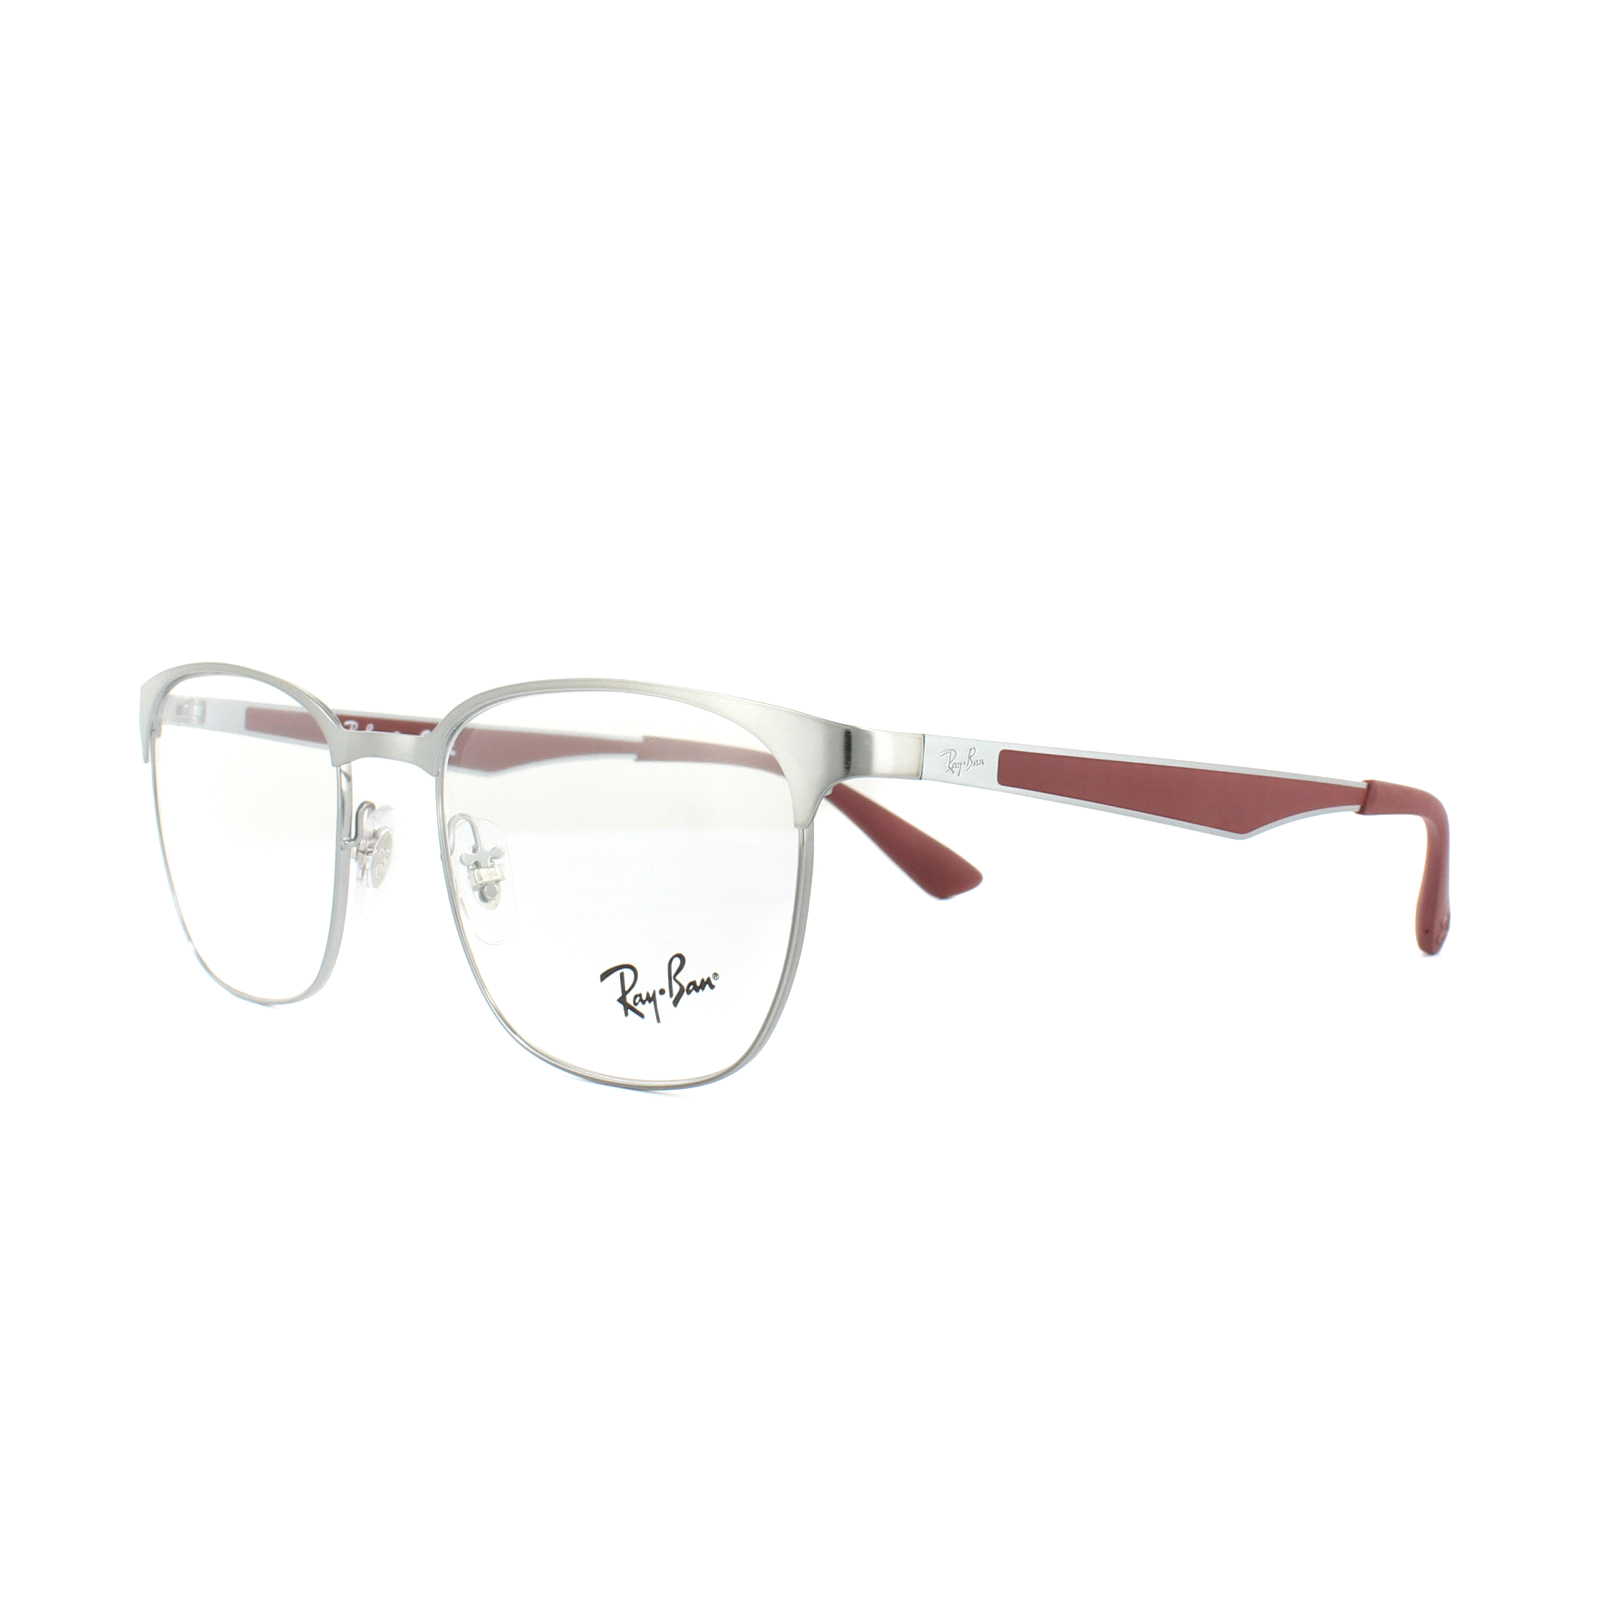 c598fa0473 Sentinel Ray-Ban Glasses Frames RX 6356 2880 Brushed Gunmetal Mens Womens  52mm